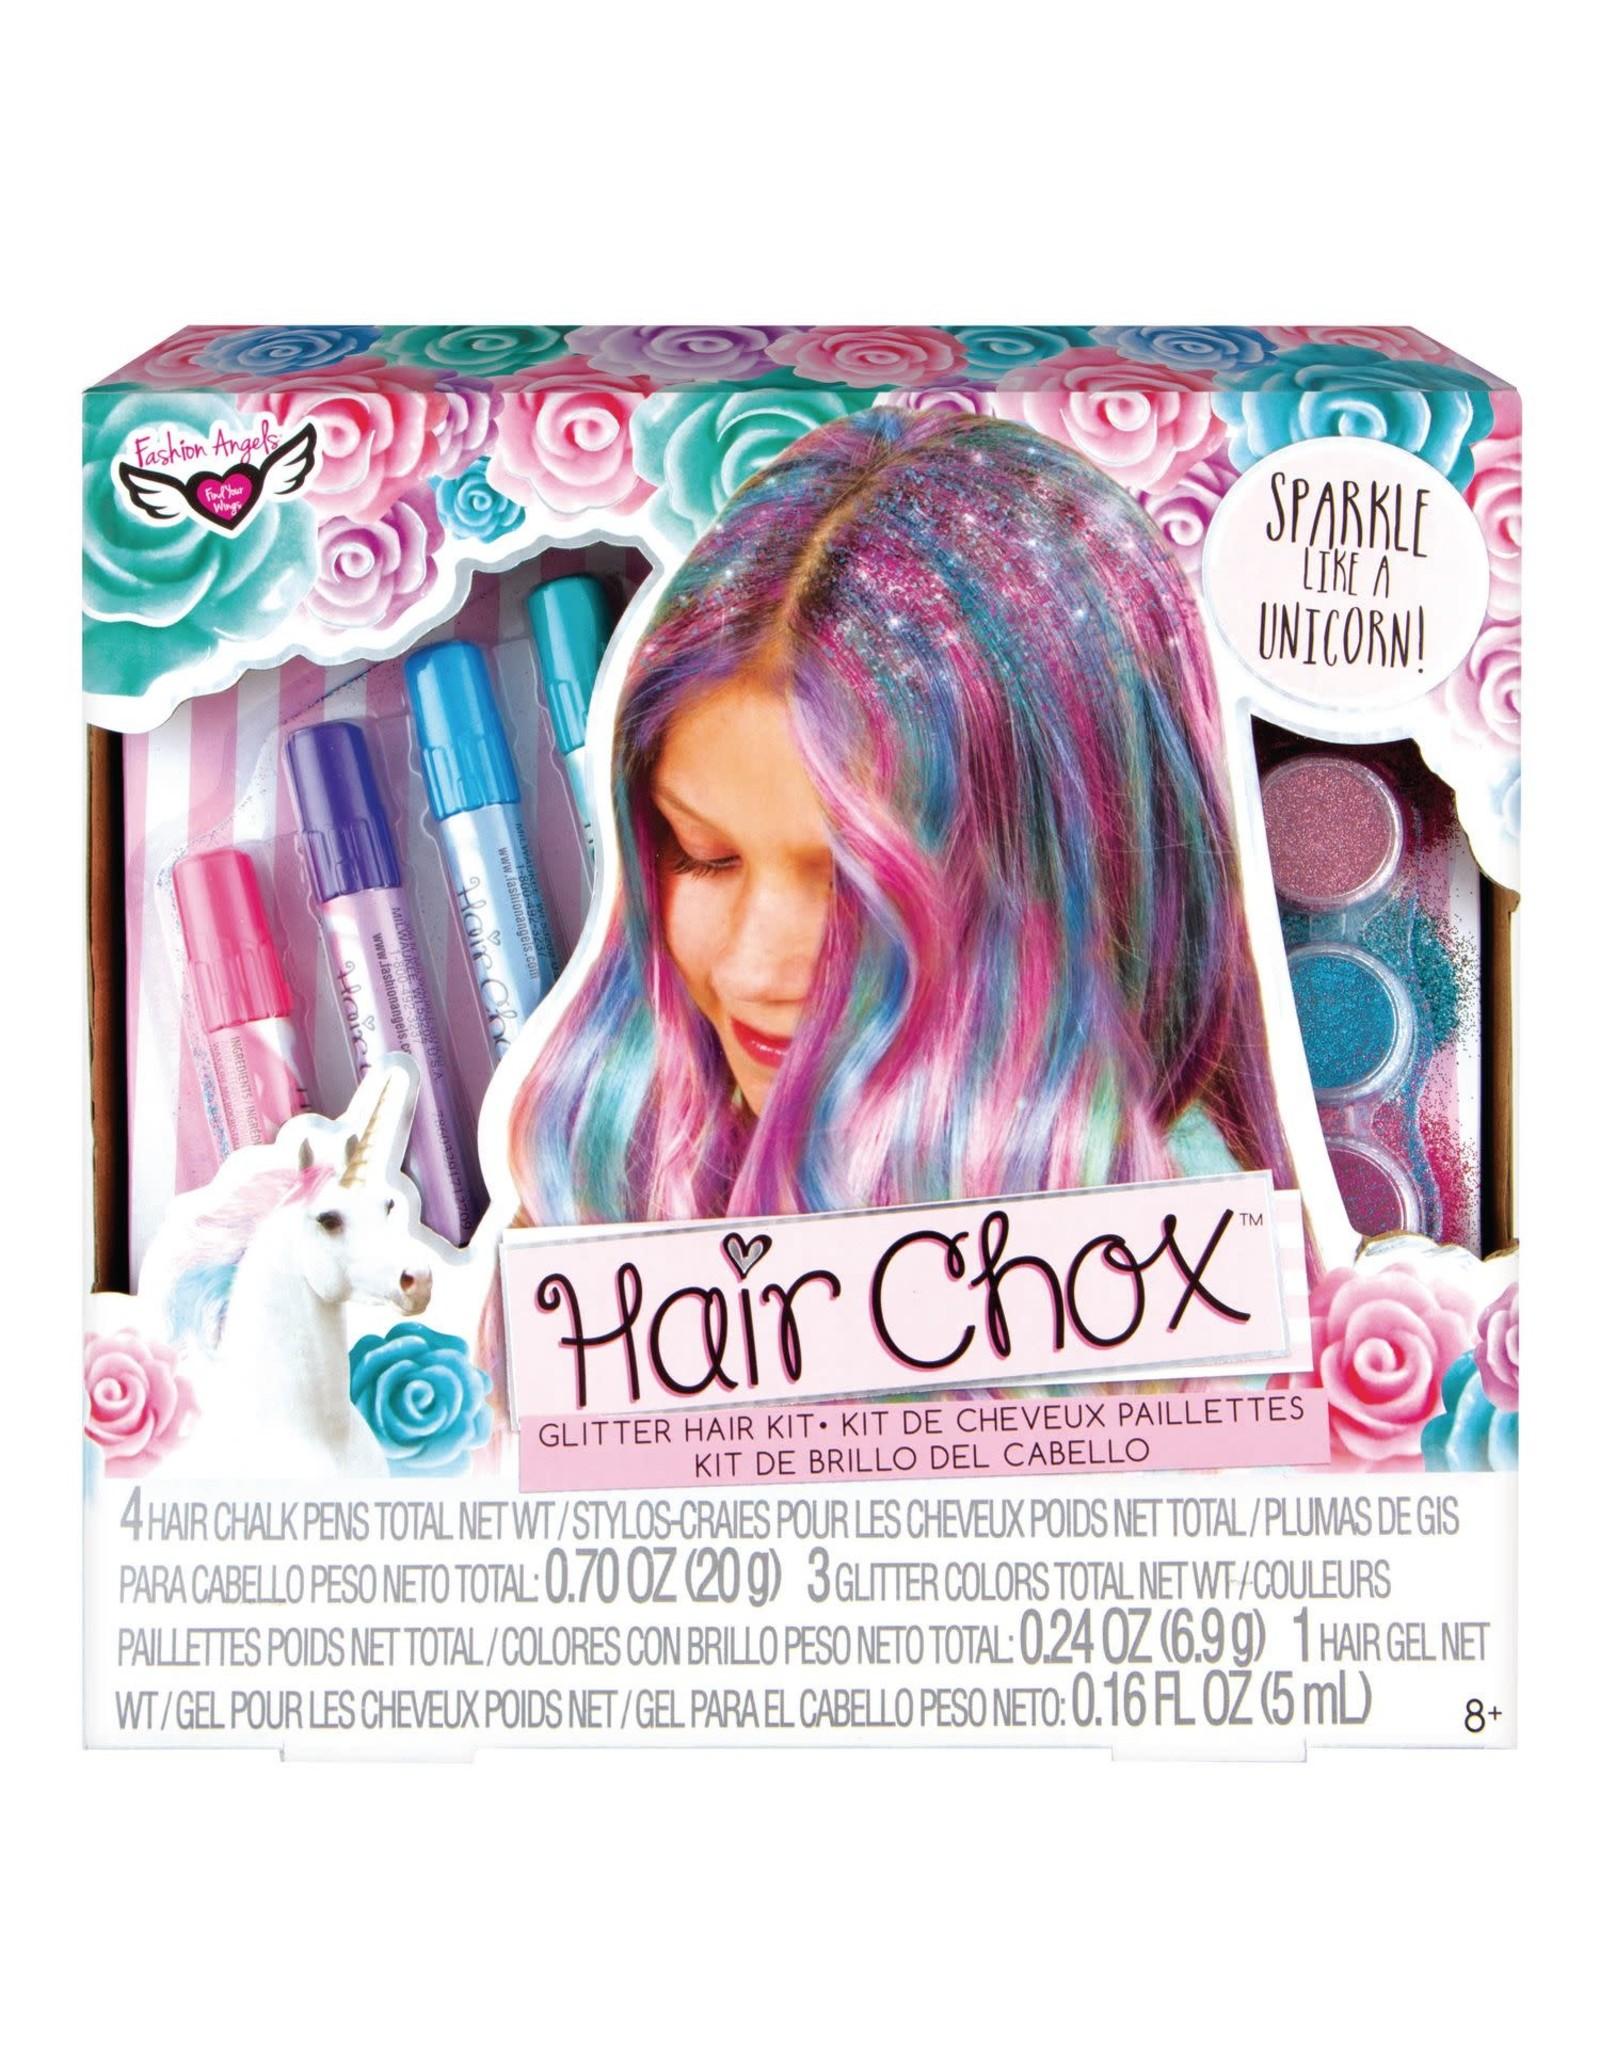 Fashion Angels Hair Chox, Hair Design Kit